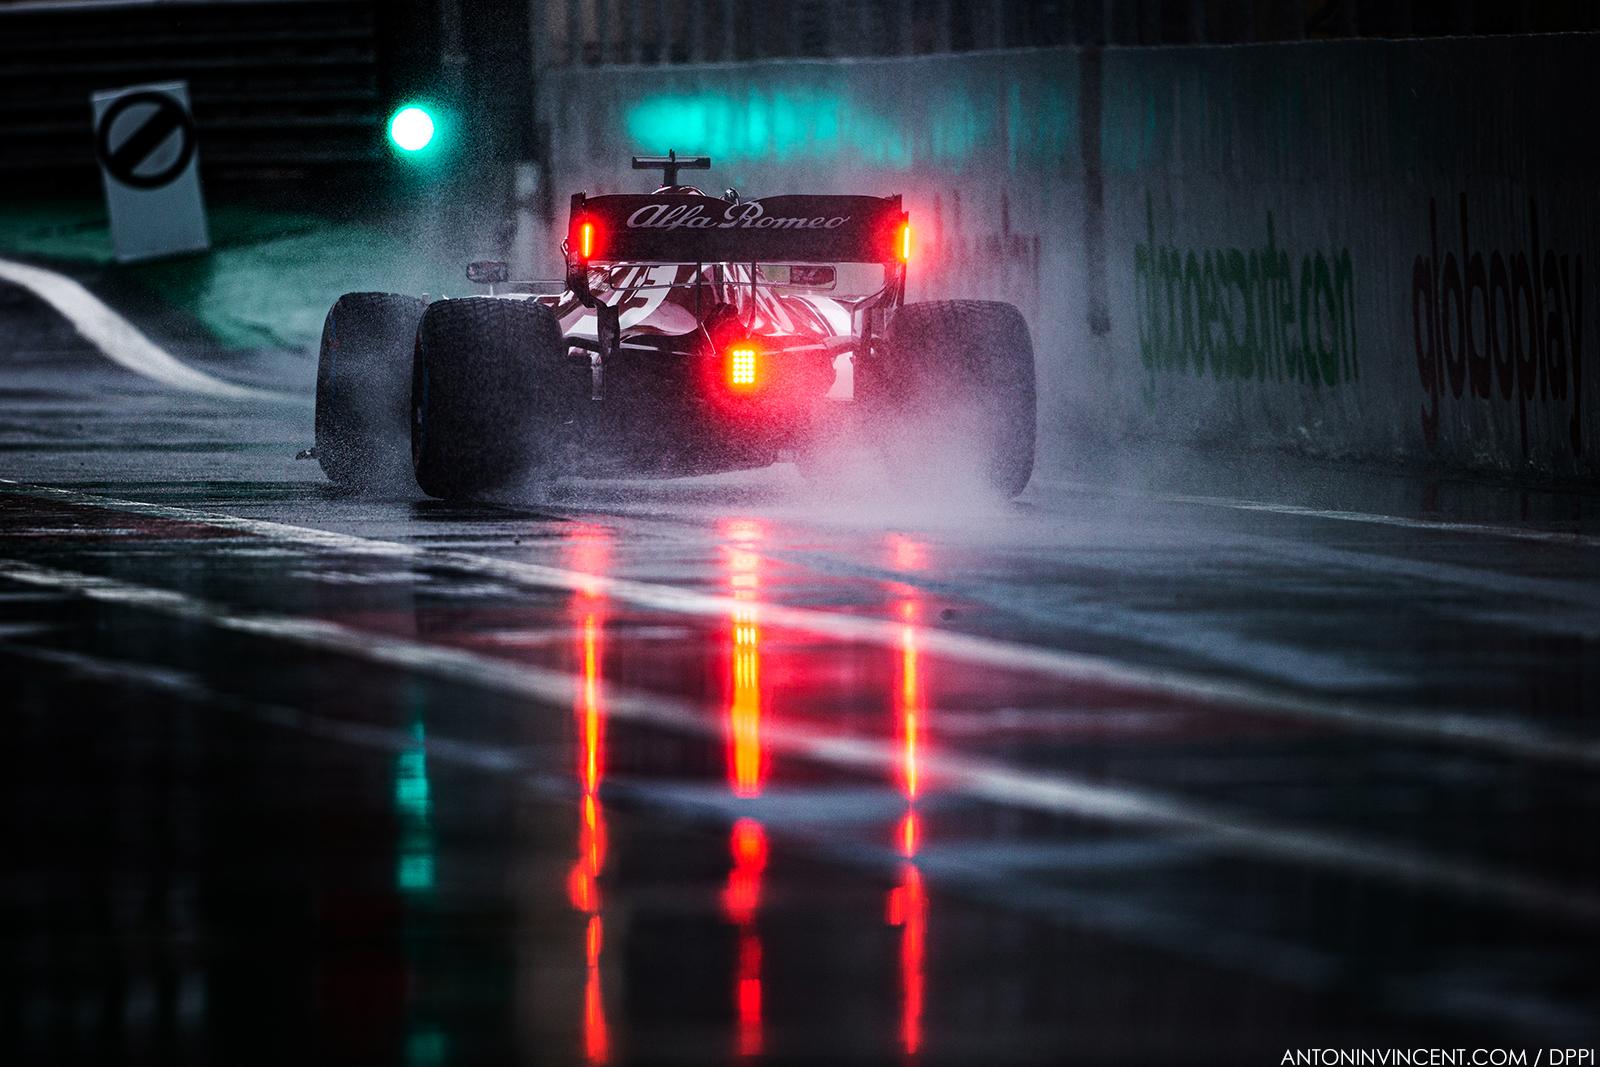 07 RAIKKONEN Kimi (fin), Alfa Romeo Racing C38, action during the 2019 Formula One World Championship, Brazil Grand Prix from November 15 to 17 in Sao Paulo, Brazil - Photo Antonin Vincent / DPPI